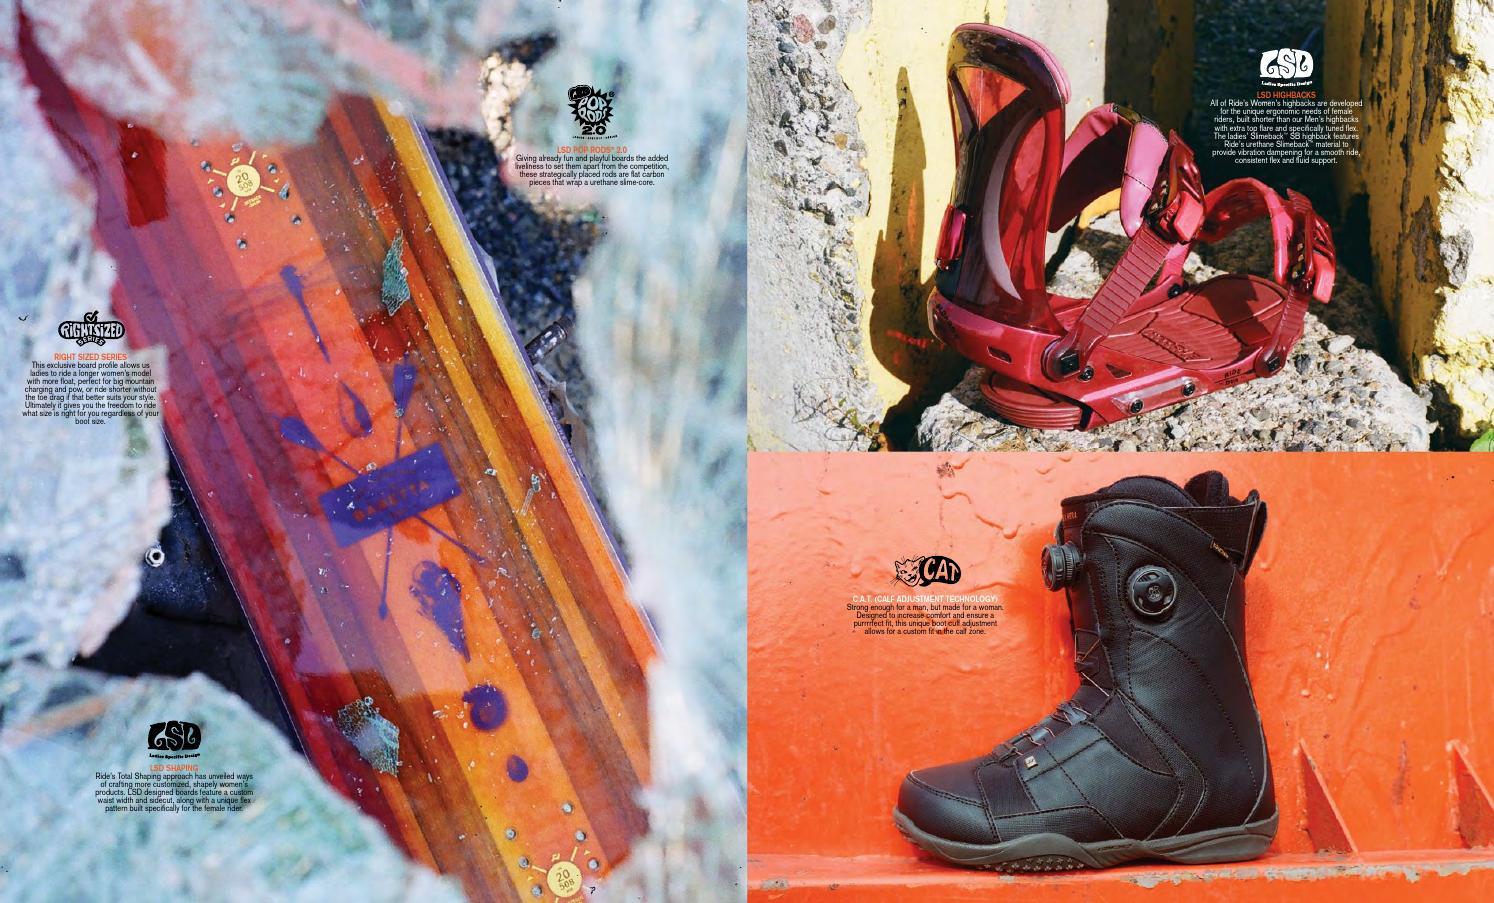 Katalog Ride 2015 By Snowsport Snowsport Issuu